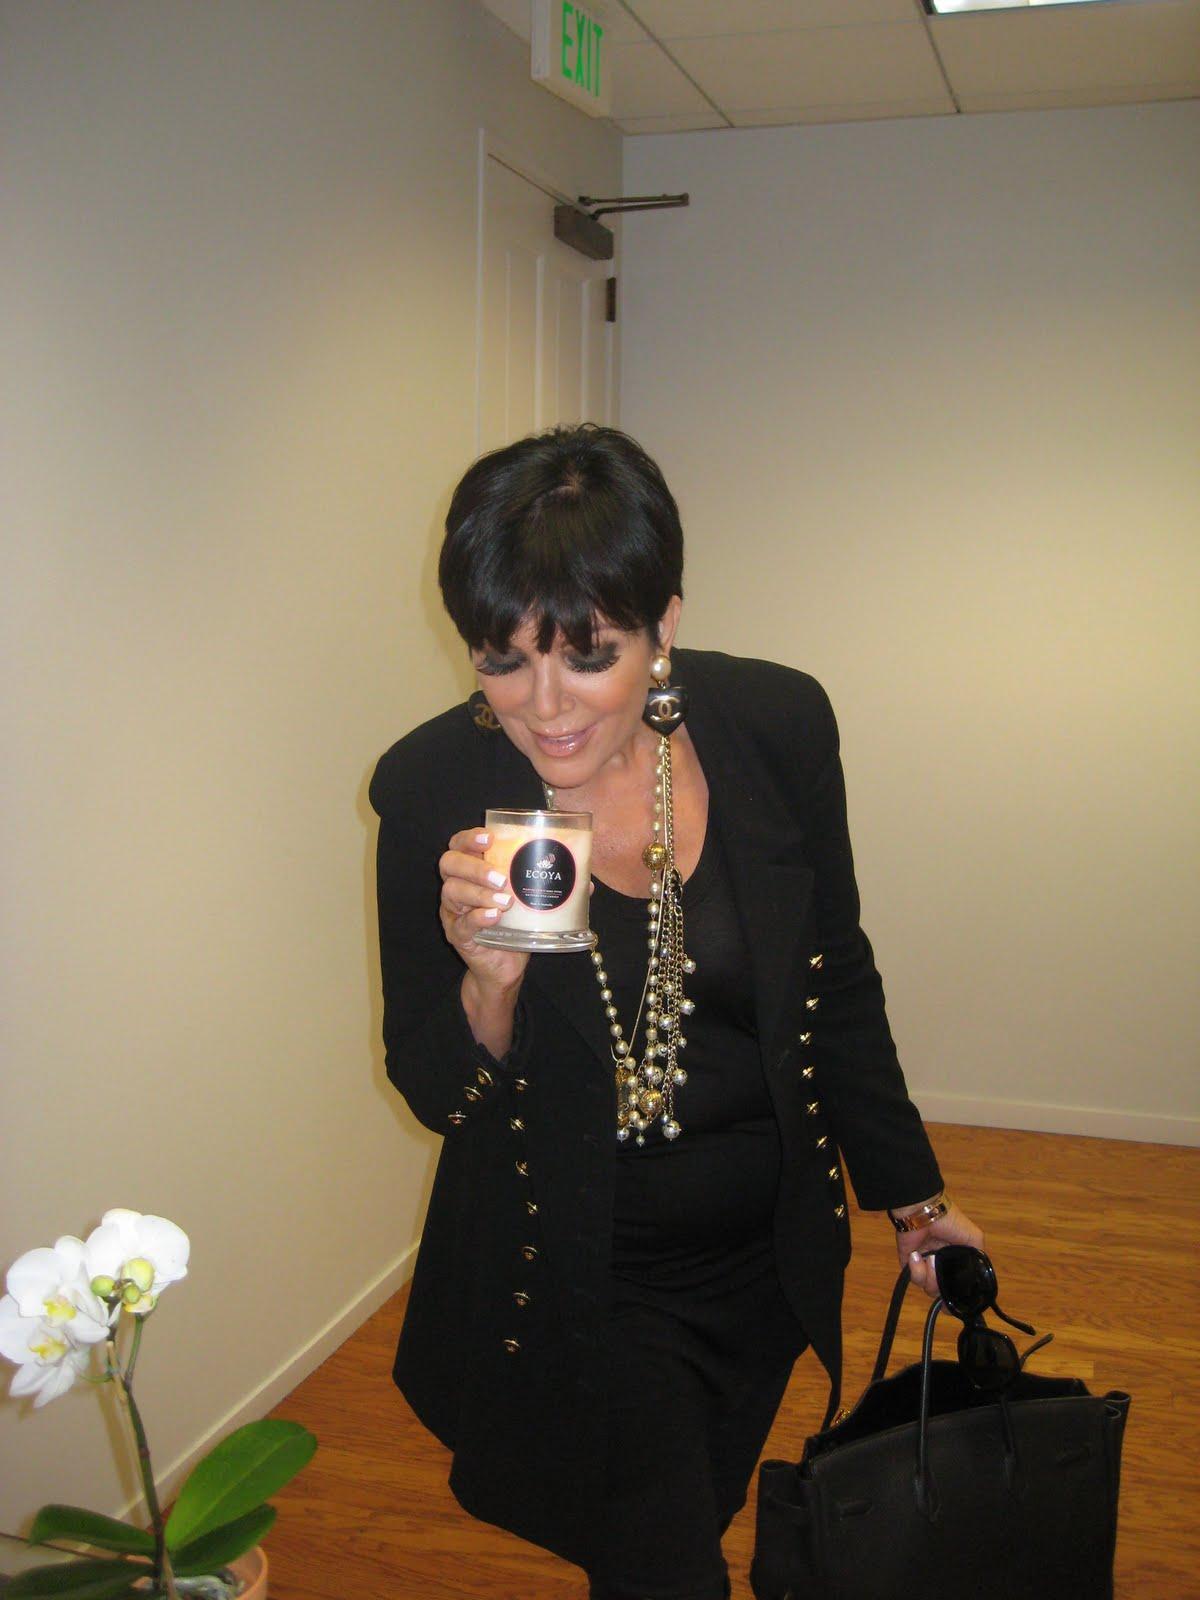 http://4.bp.blogspot.com/_p109q1yrogU/TMyMtfIMCsI/AAAAAAAAE-E/KBgxYSbib1U/s1600/Kris+Kardashian.jpg